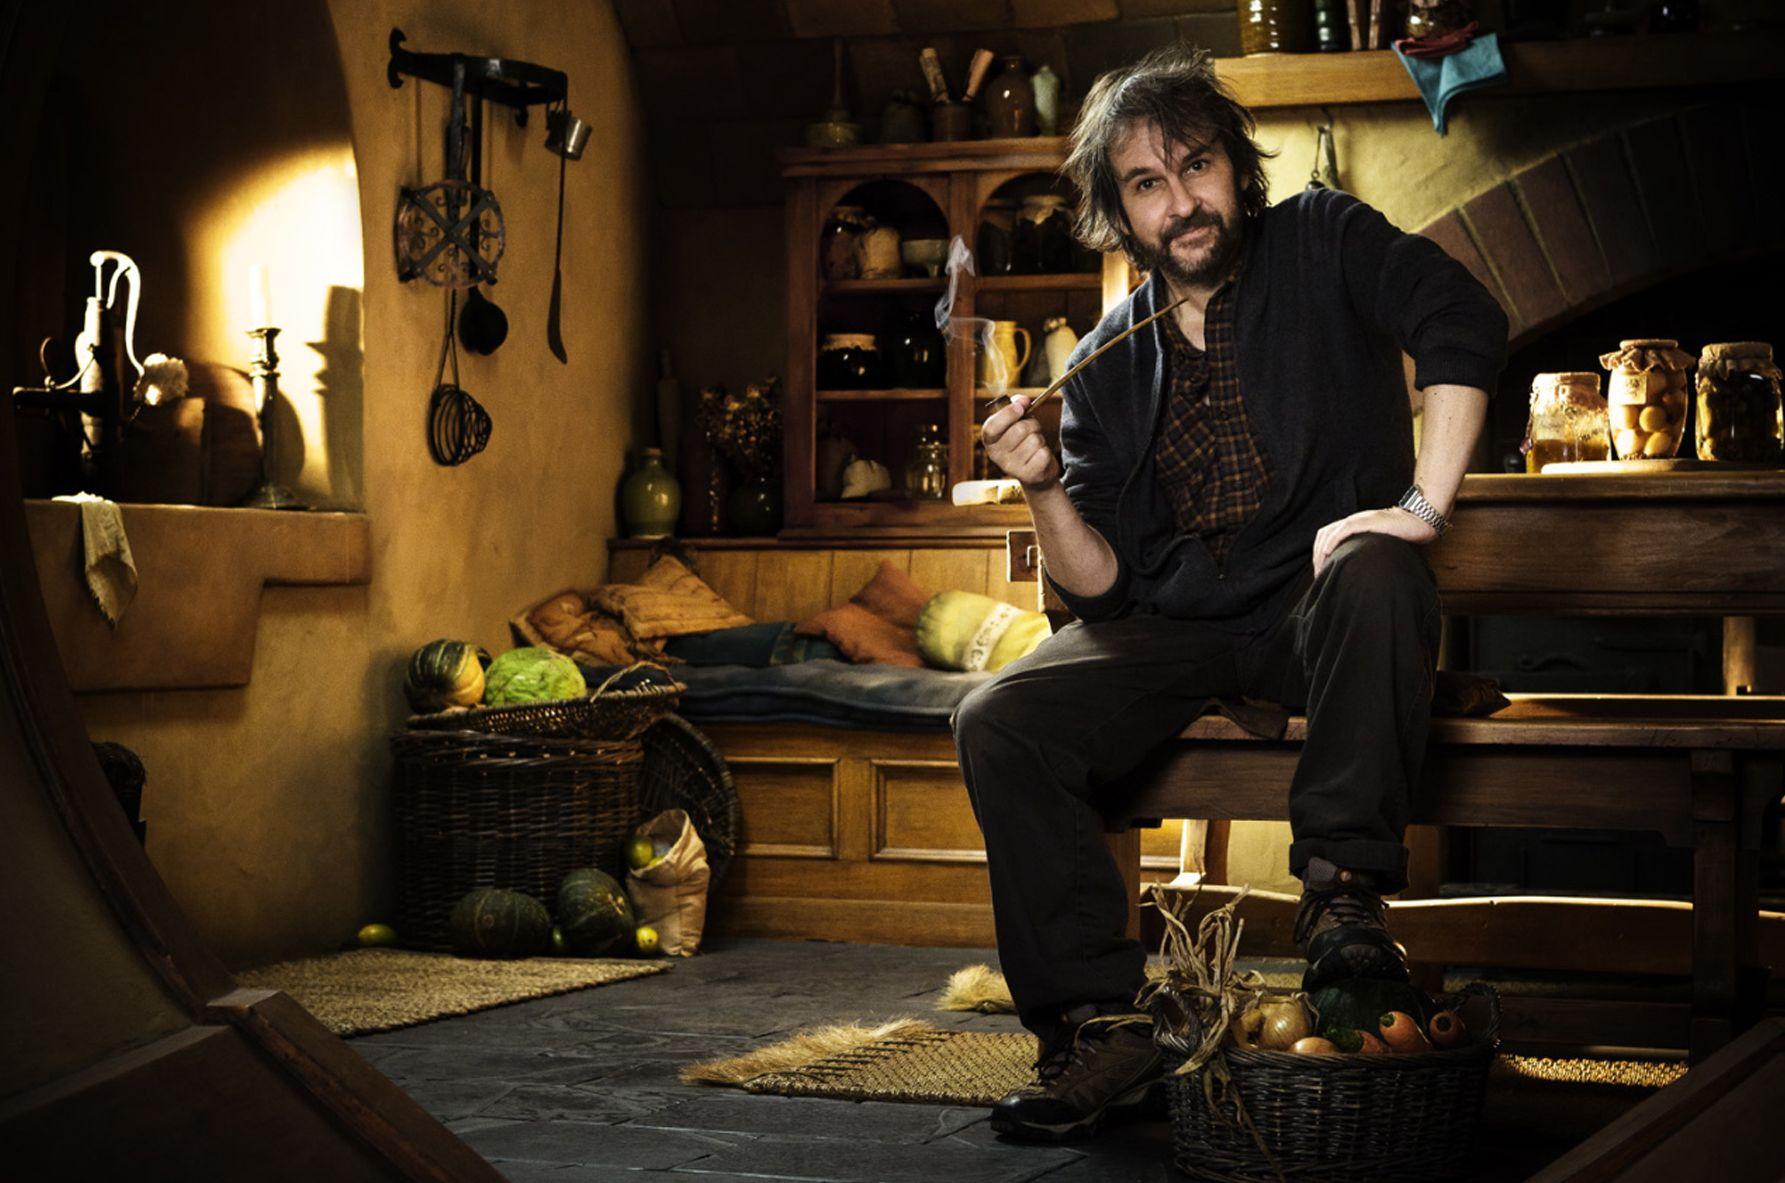 Watch Peter Jackson to produce Hobbit films video